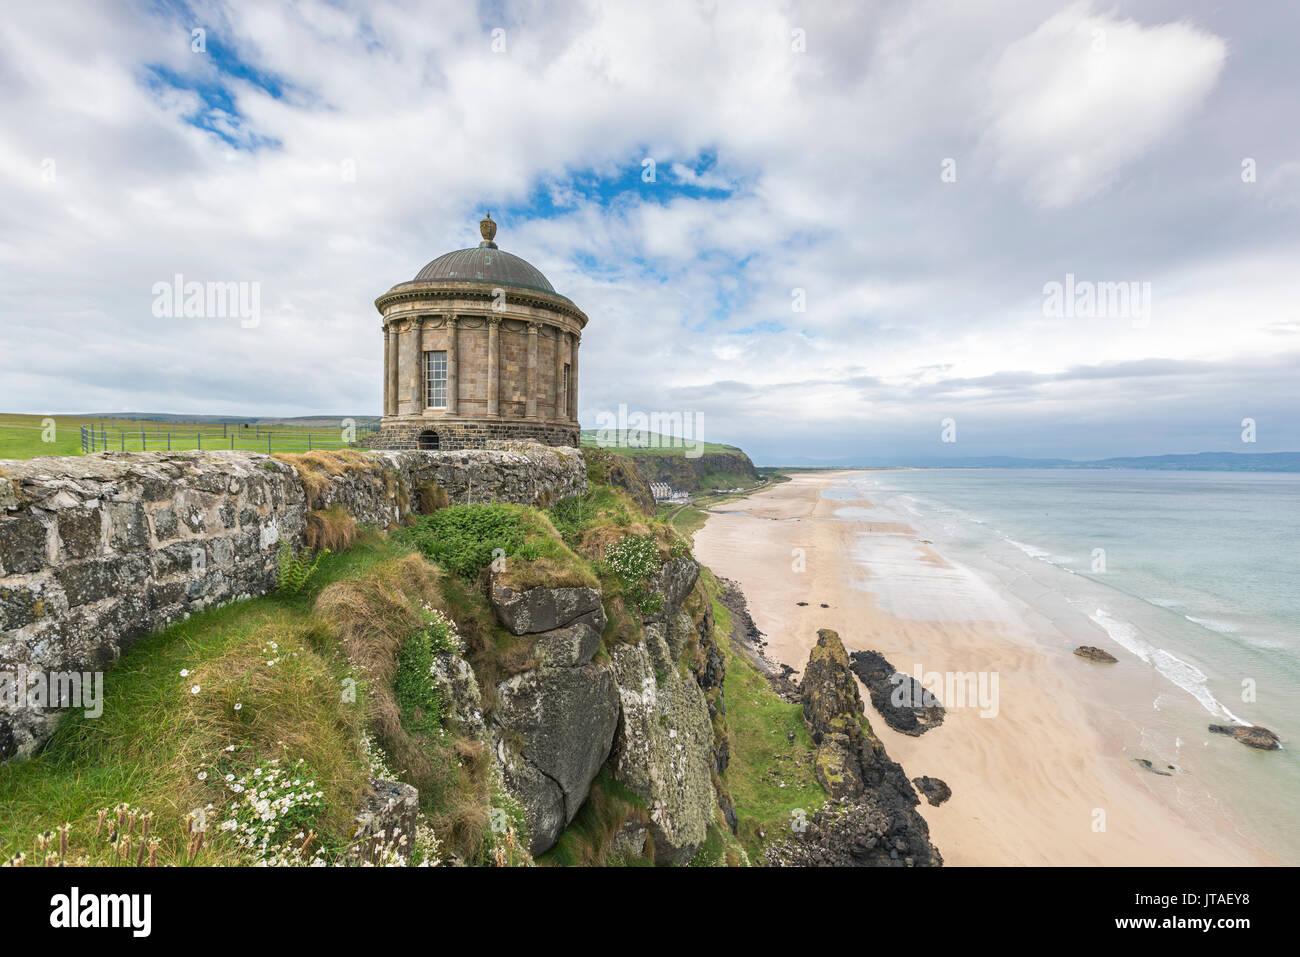 Mussenden Temple, Castlerock, County Londonderry, Ulster region, Northern Ireland, United Kingdom, Europe - Stock Image